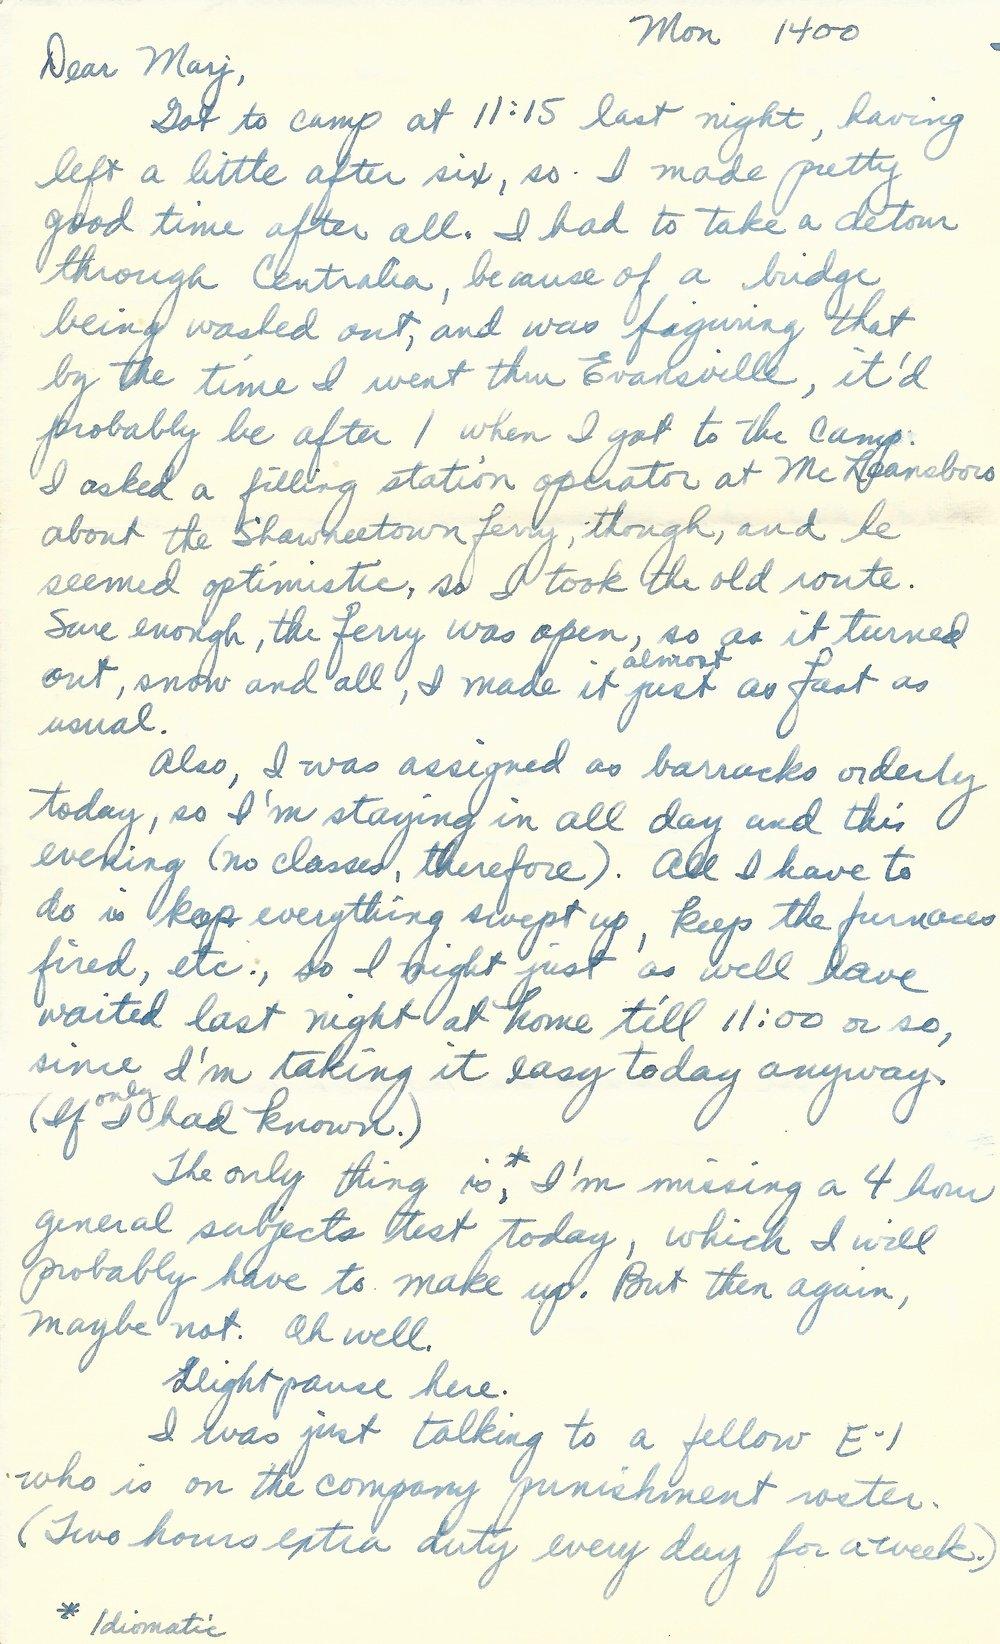 3. Dec. 15, 1952 (Opa)_Page_2.jpg